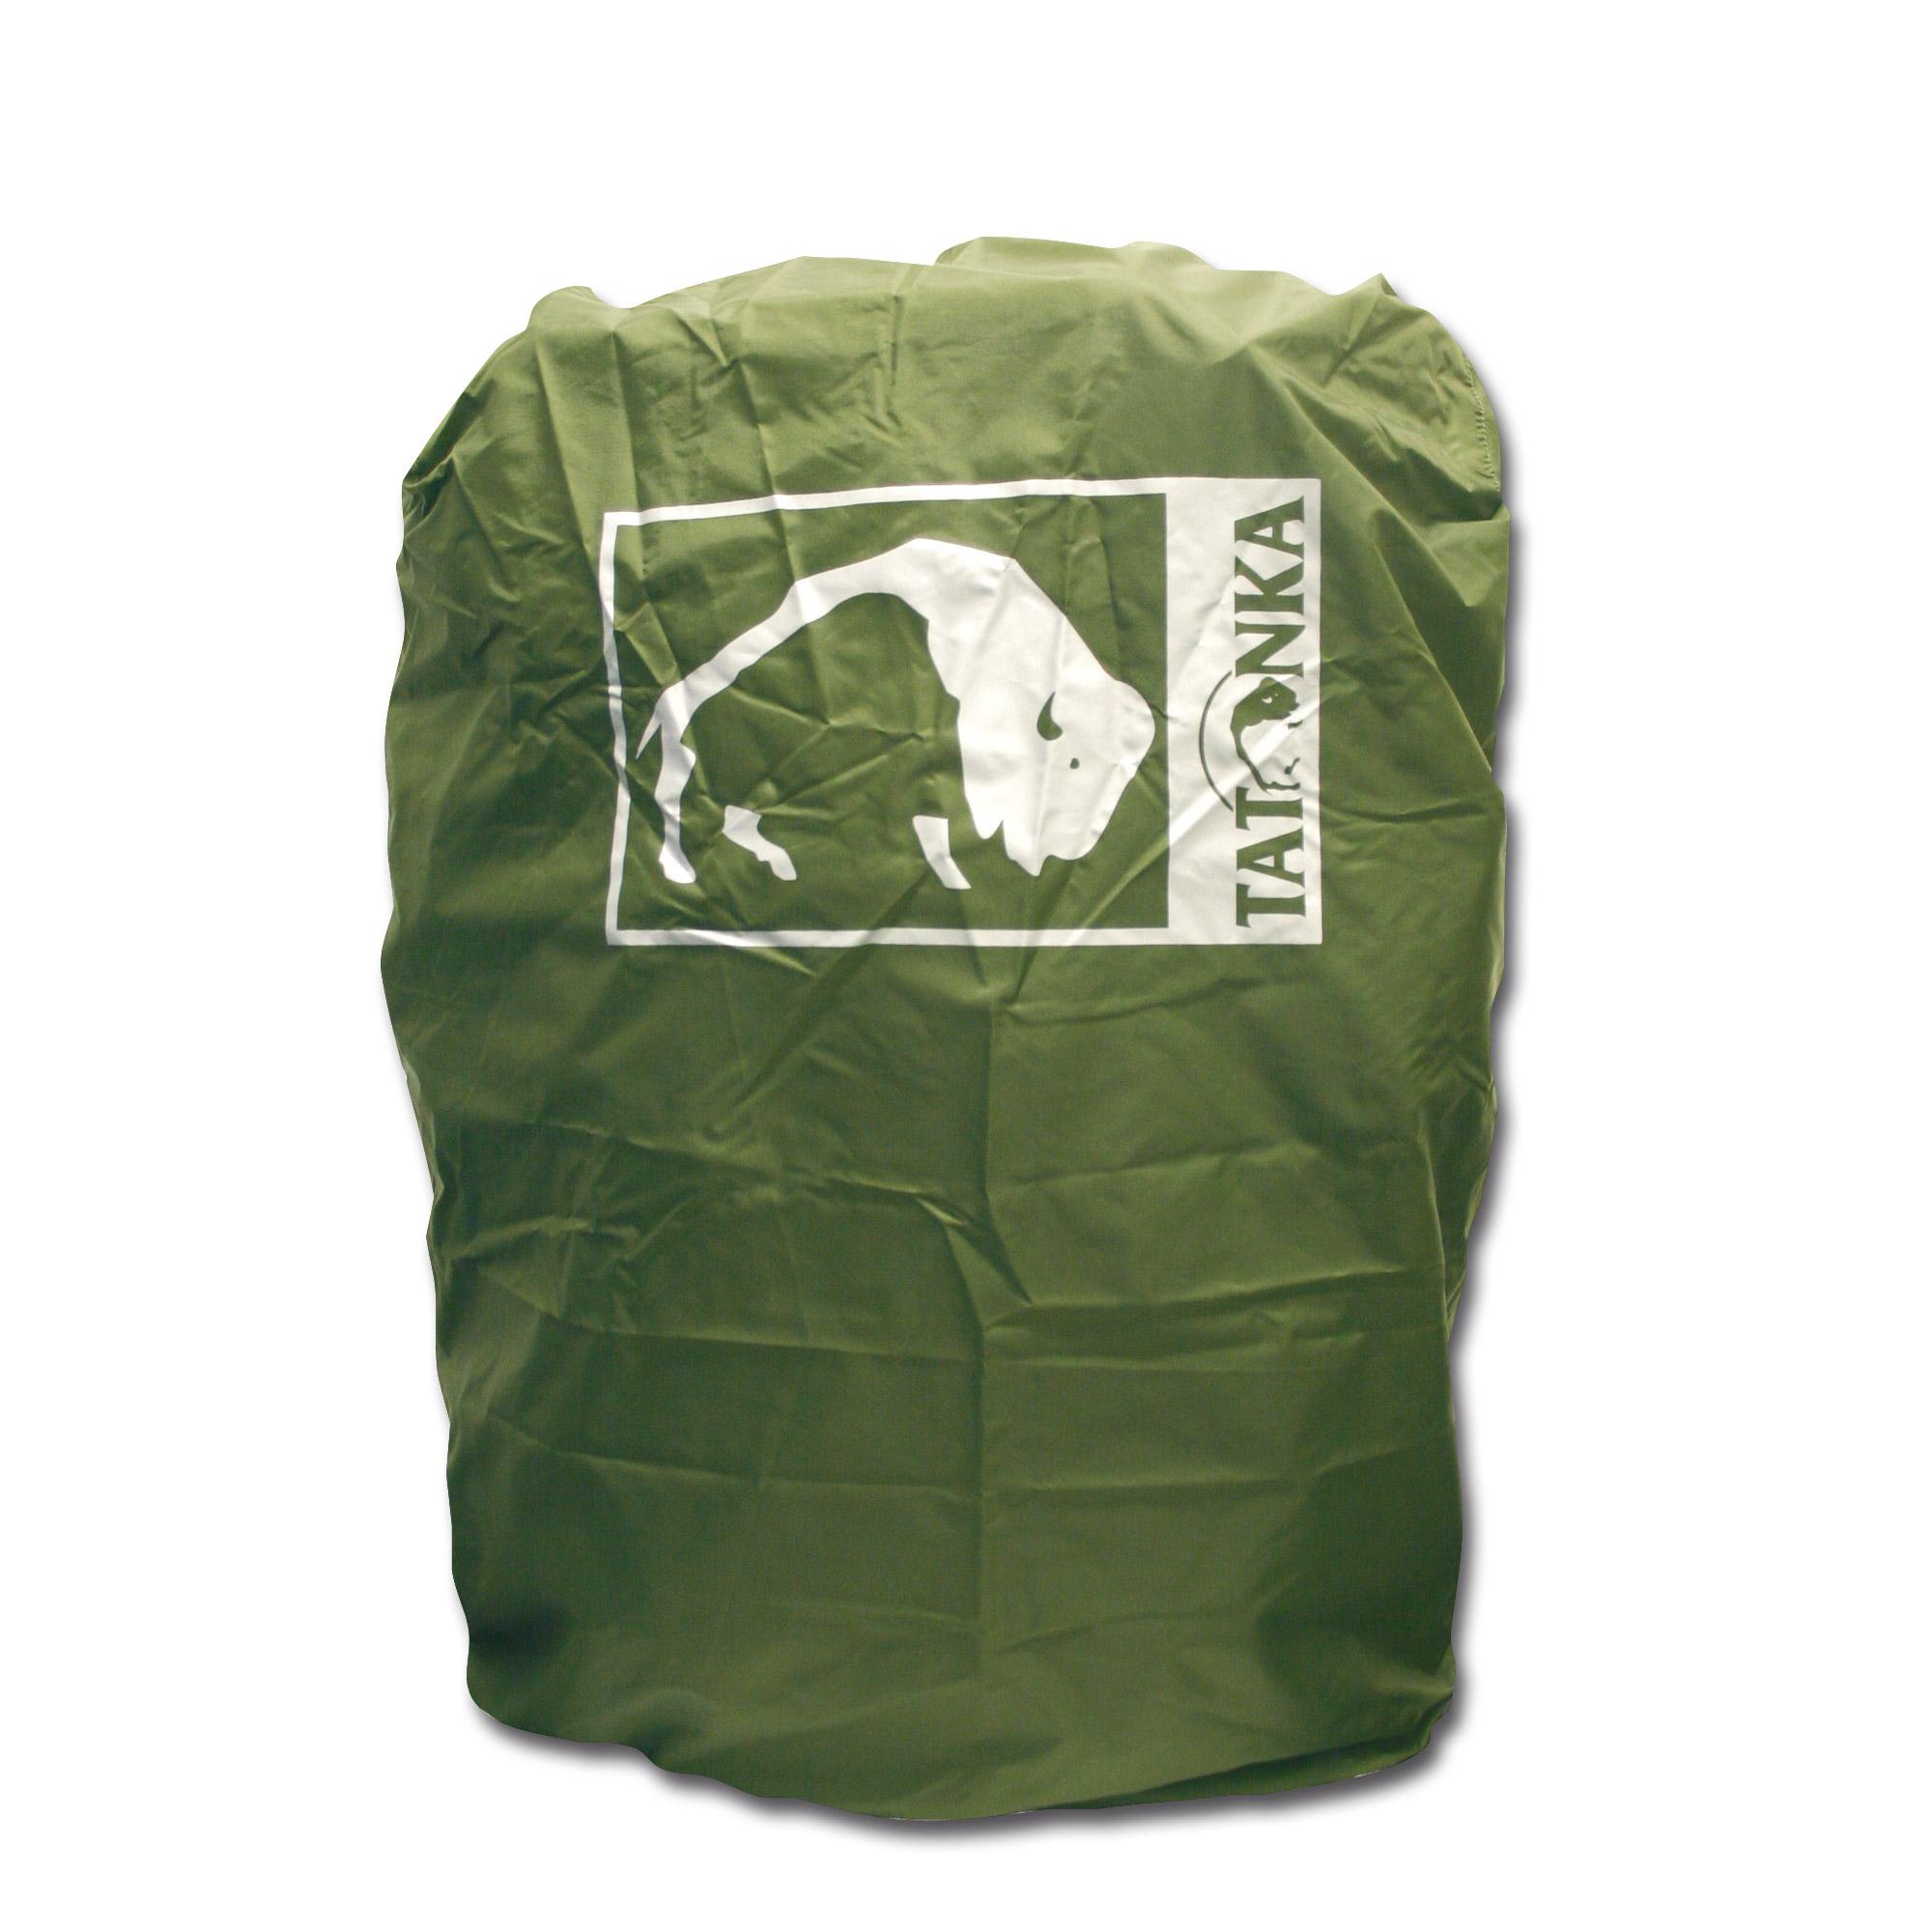 Funda Tatonka para mochila tamaño M. verde